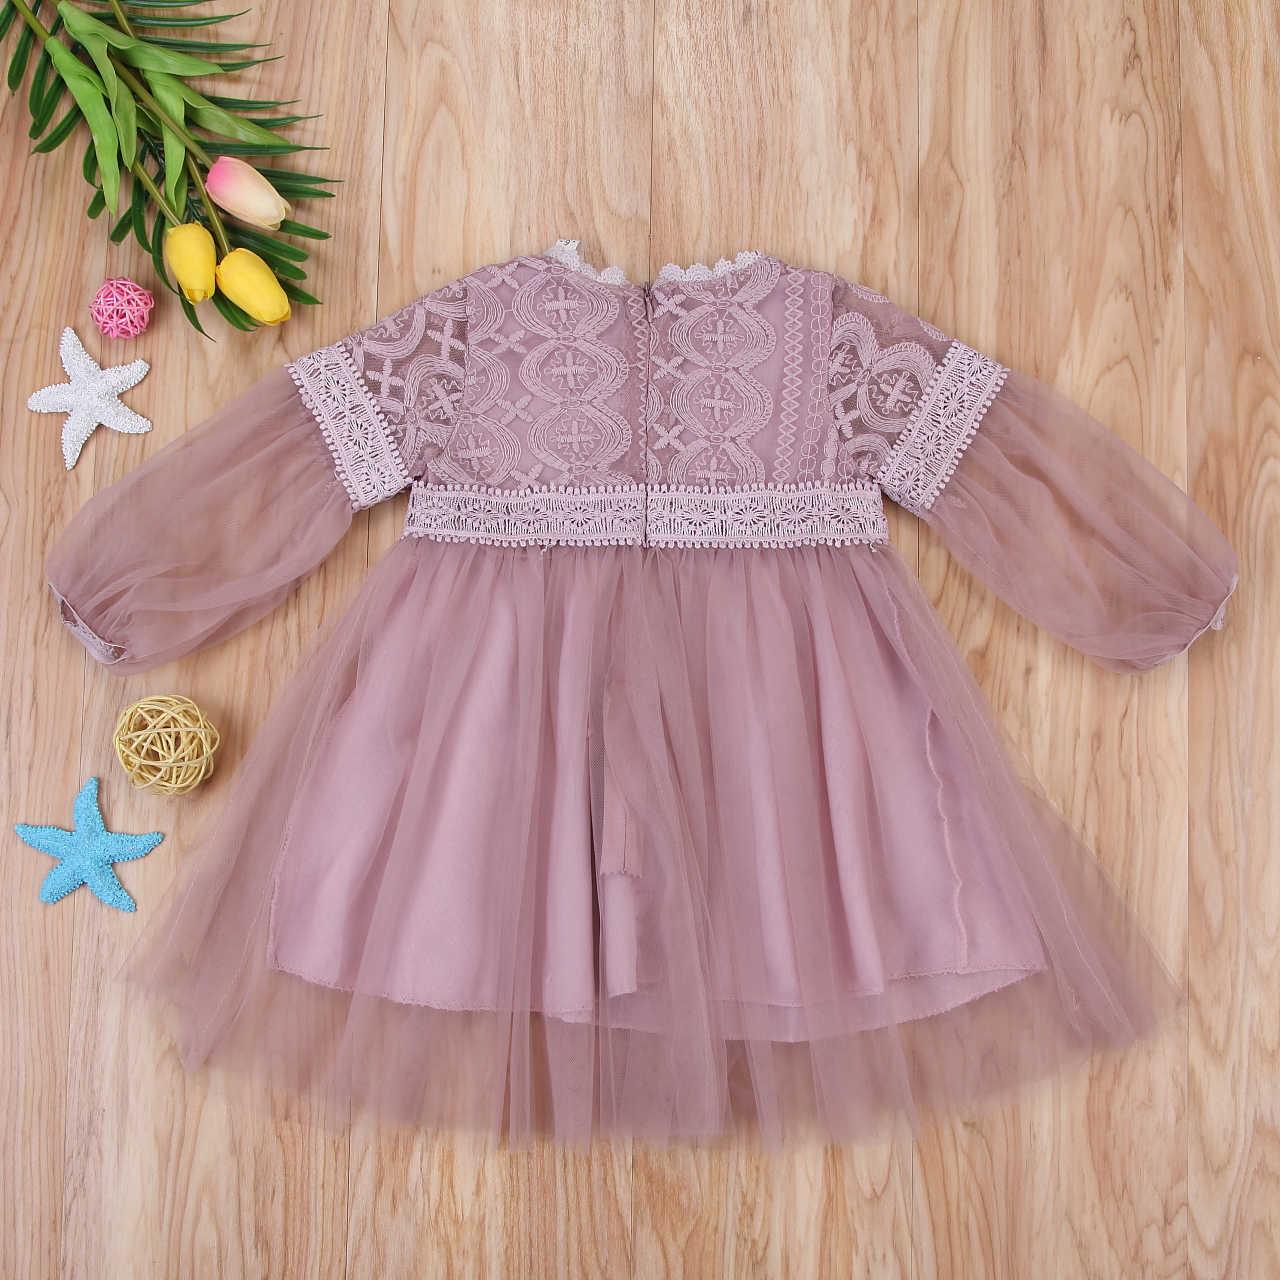 9d08887d6 ... Mesh Tutu Dress Gray/Pink Baby Girls Long Sleeve Kids Hot Tulle Party  Wedding Dress ...